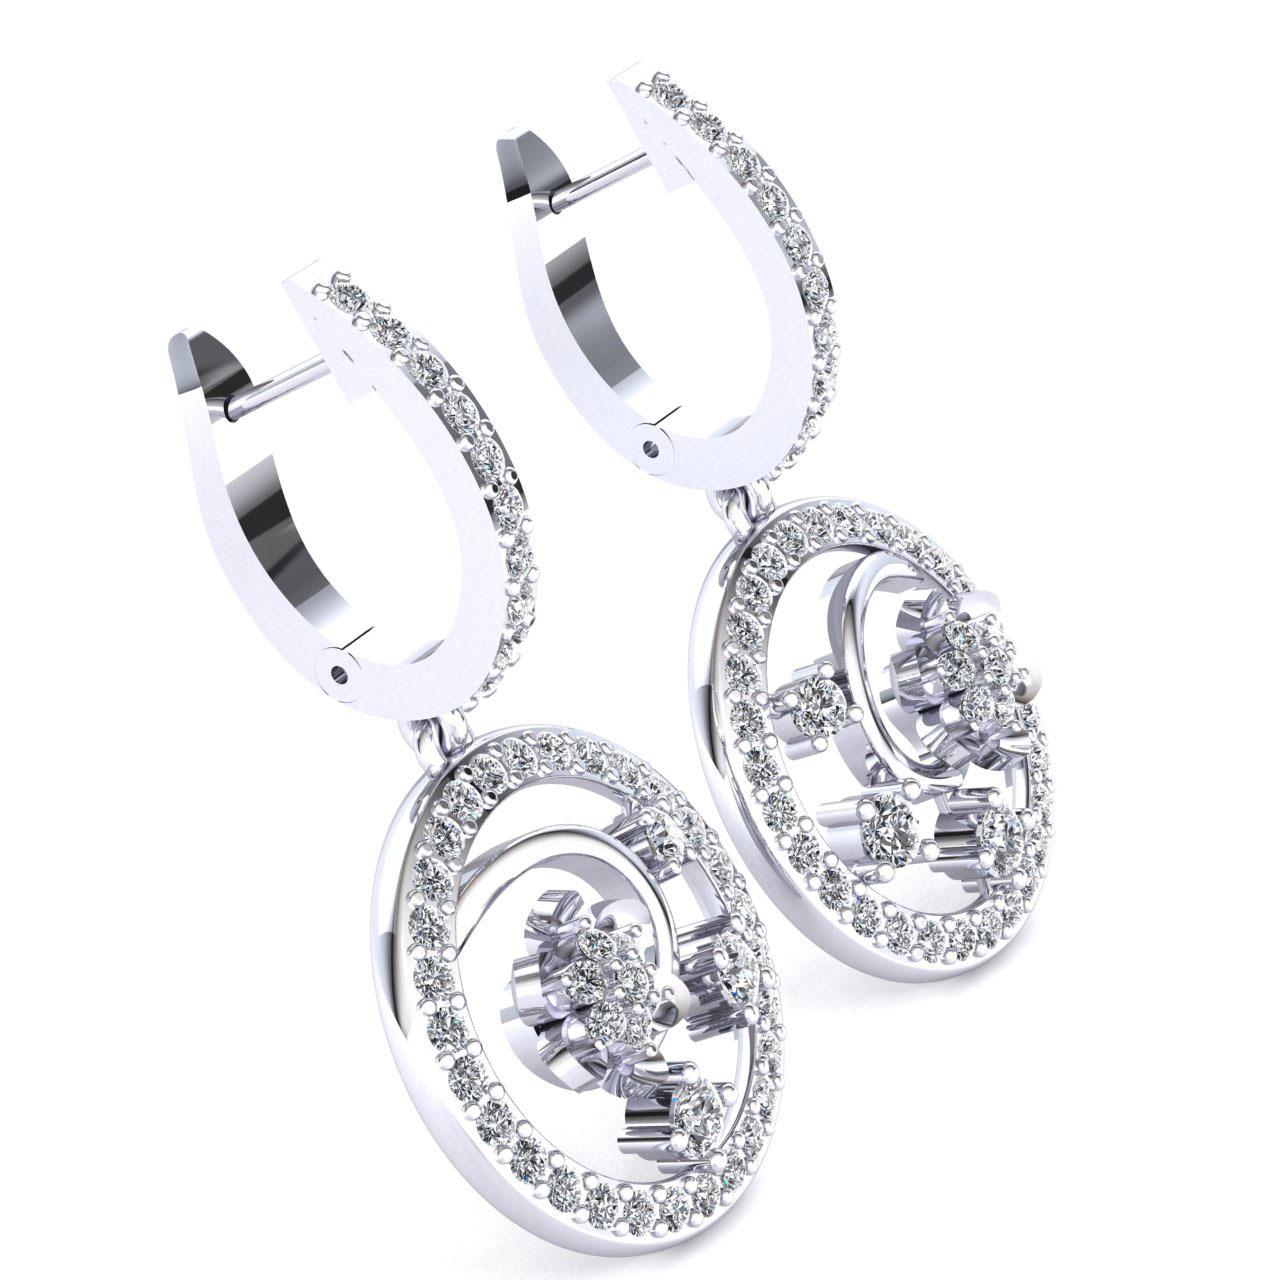 Genuine-1-15carat-Round-Cut-Diamond-Ladies-Flower-Circles-Earrings-14K-Gold thumbnail 11